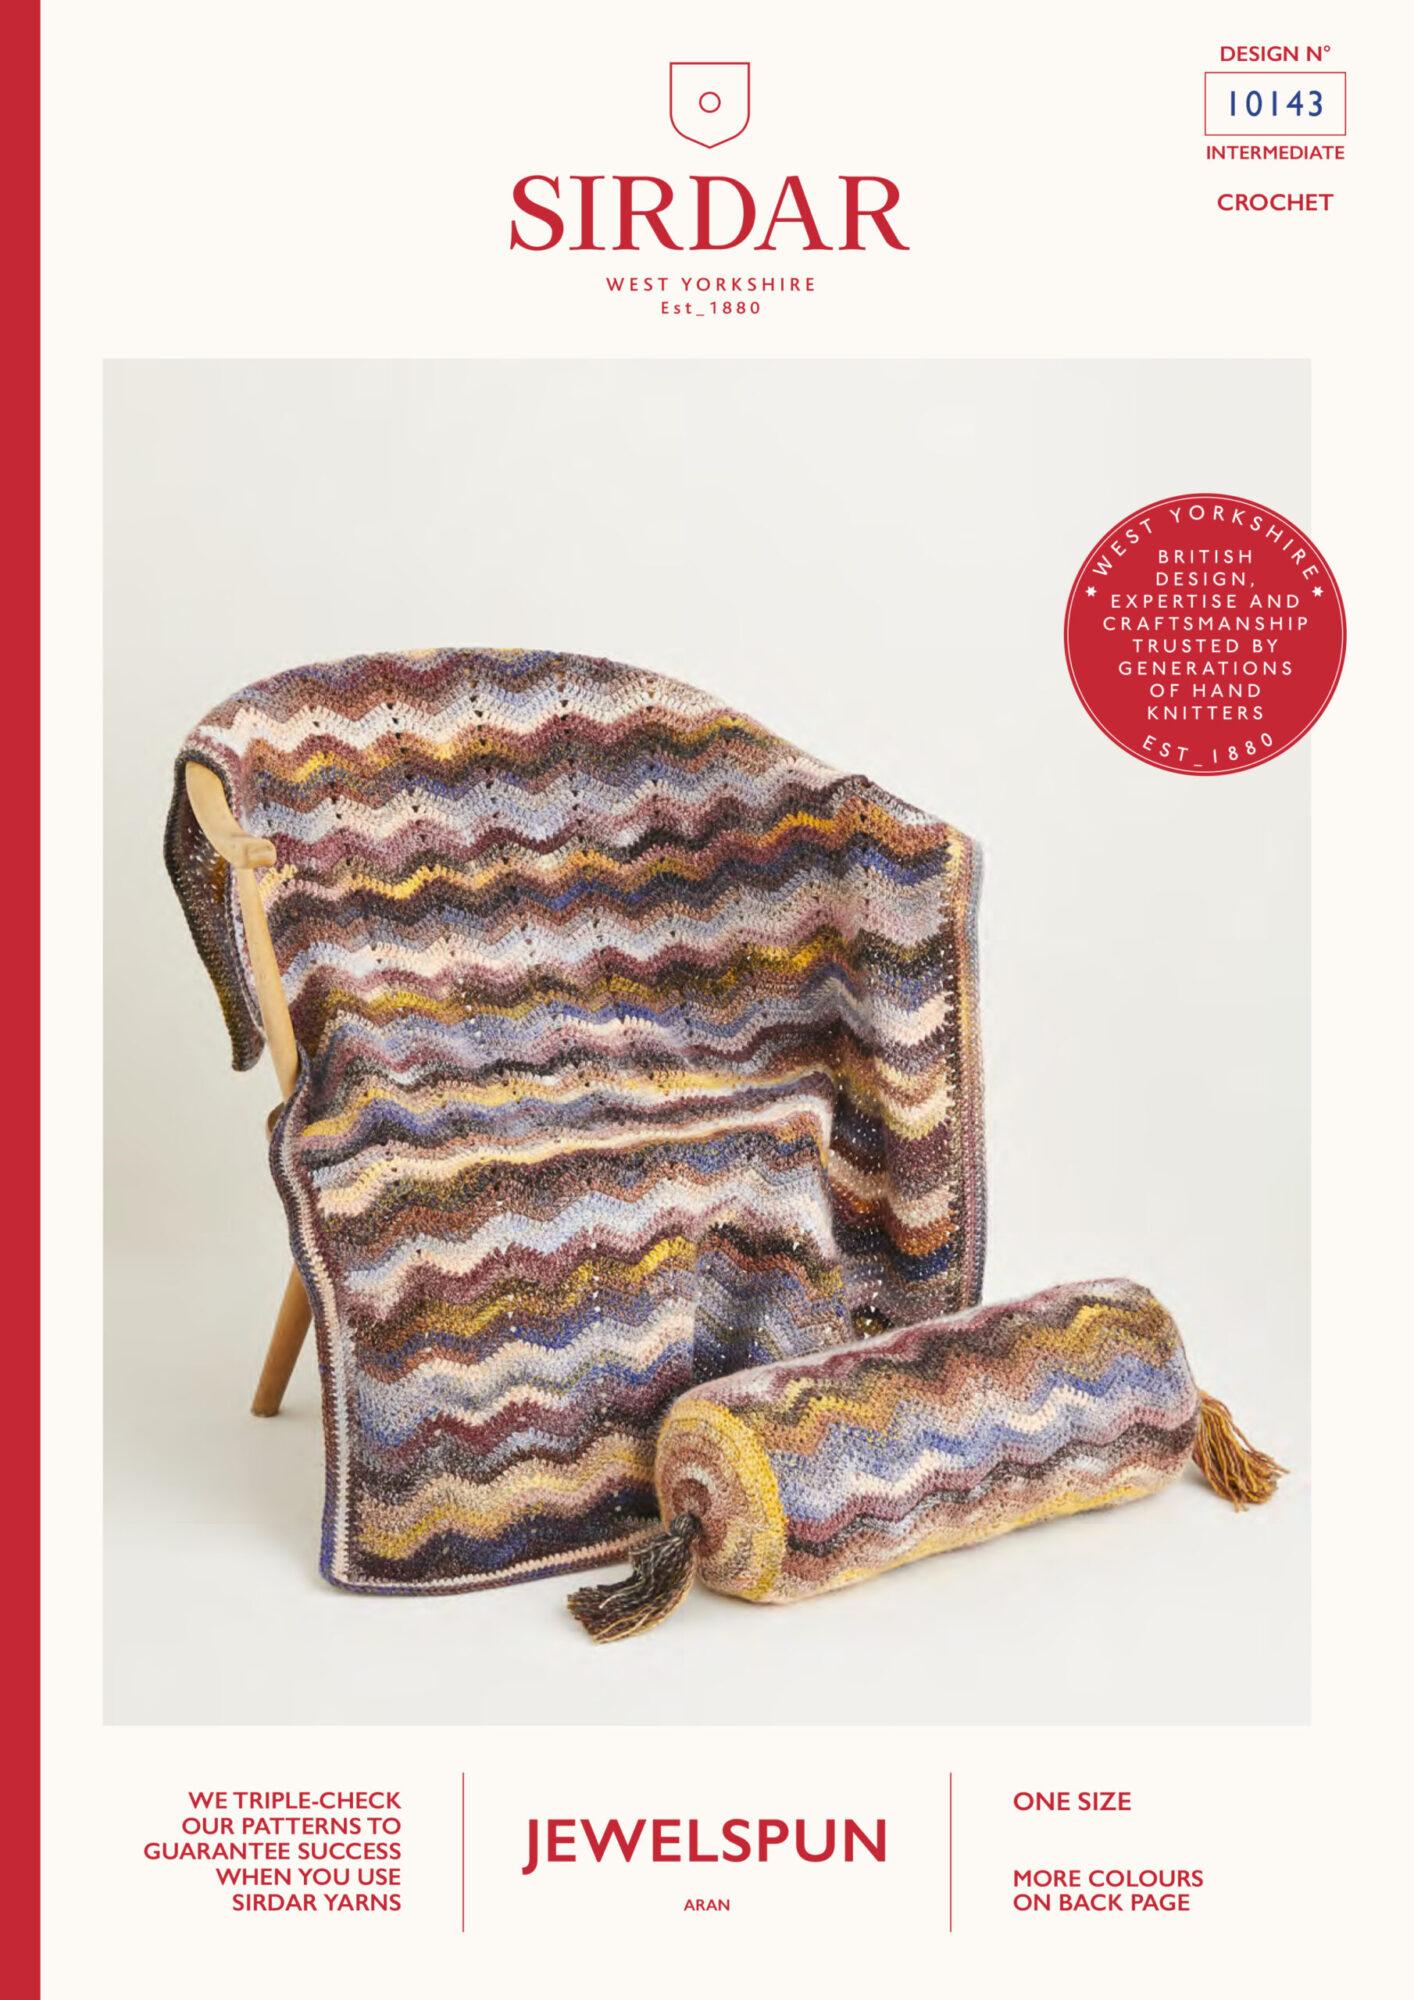 Sirdar Pattern Jewelspun  10143 (Download) product image